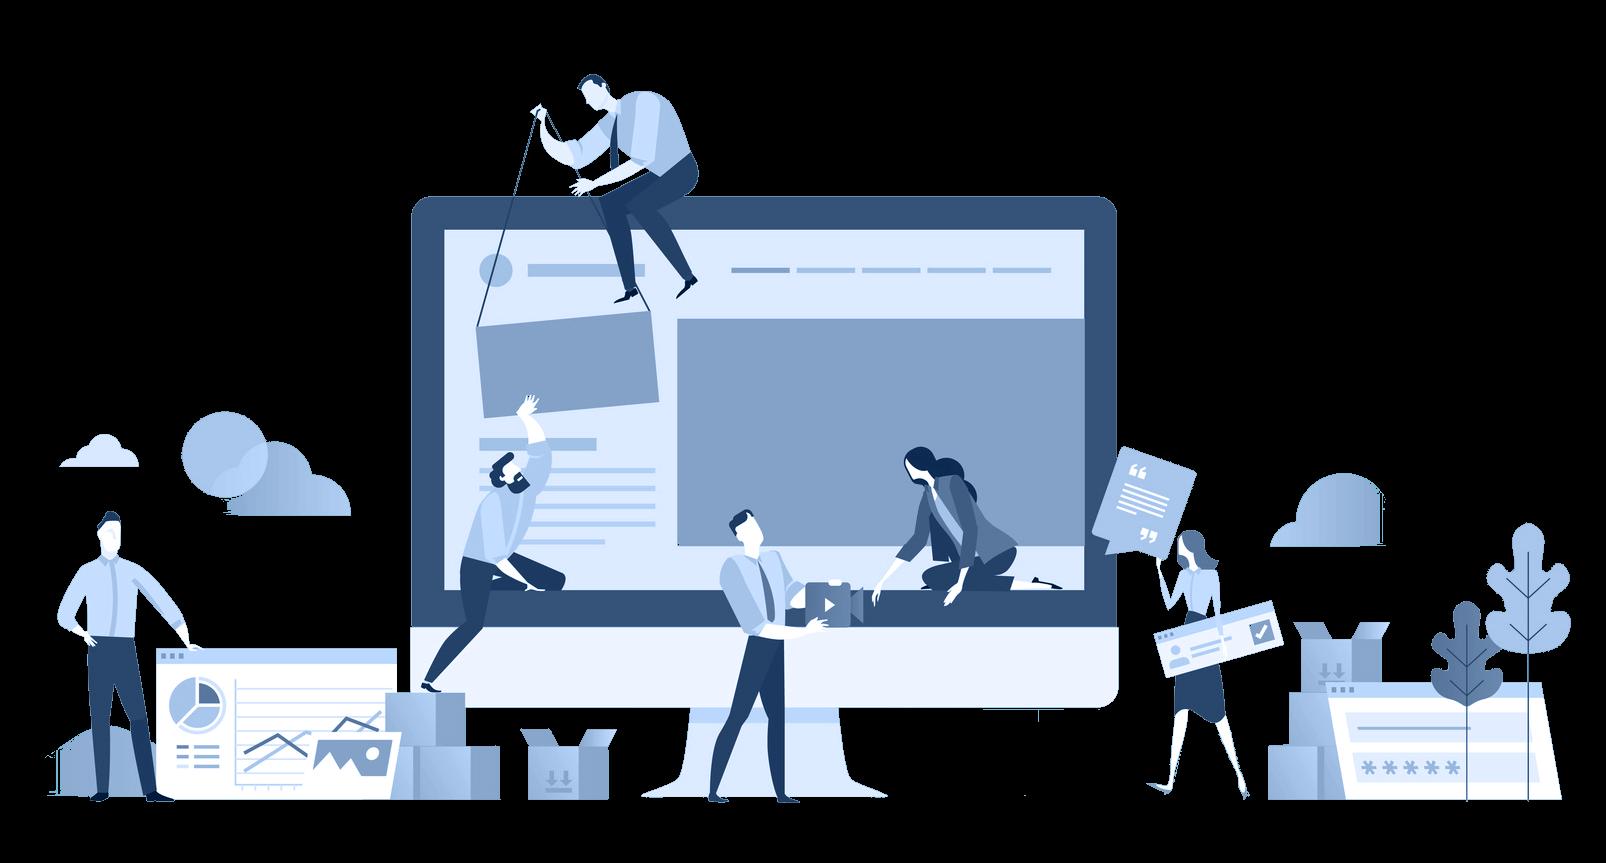 Comparing Successful E-Commerce Business Models